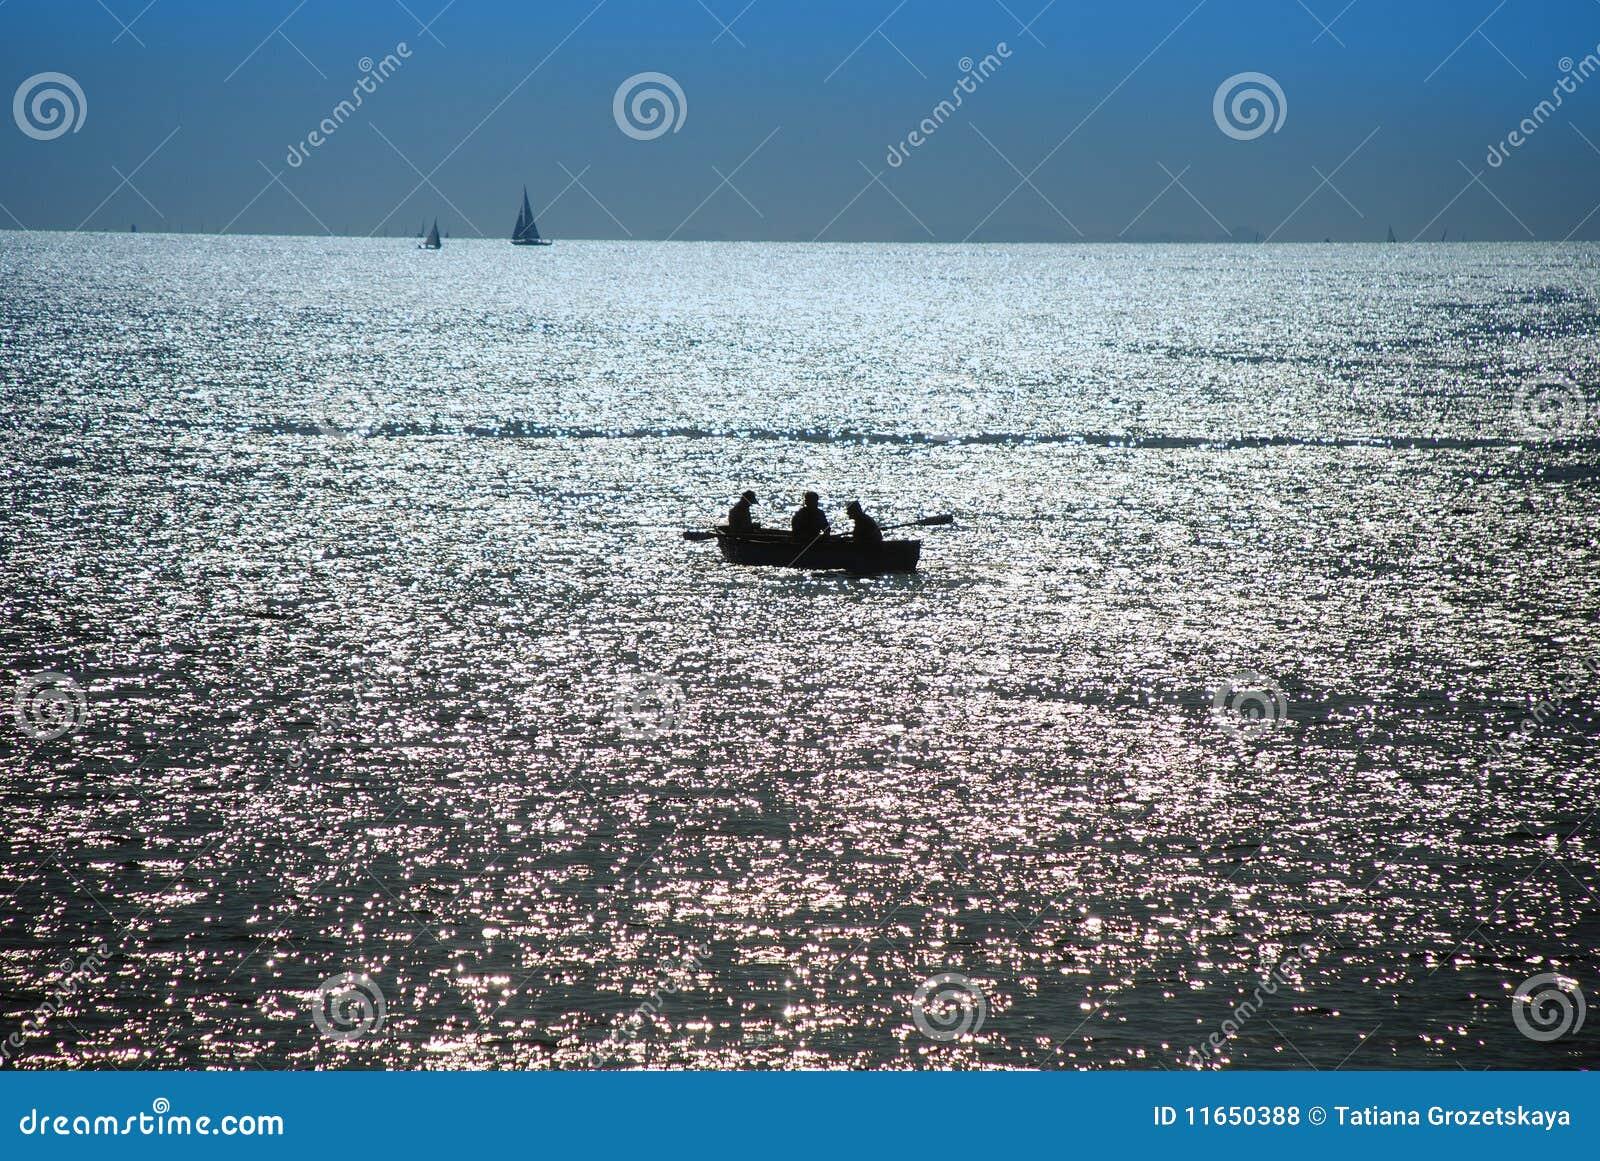 Crepúsculo sobre o mar, pescadores